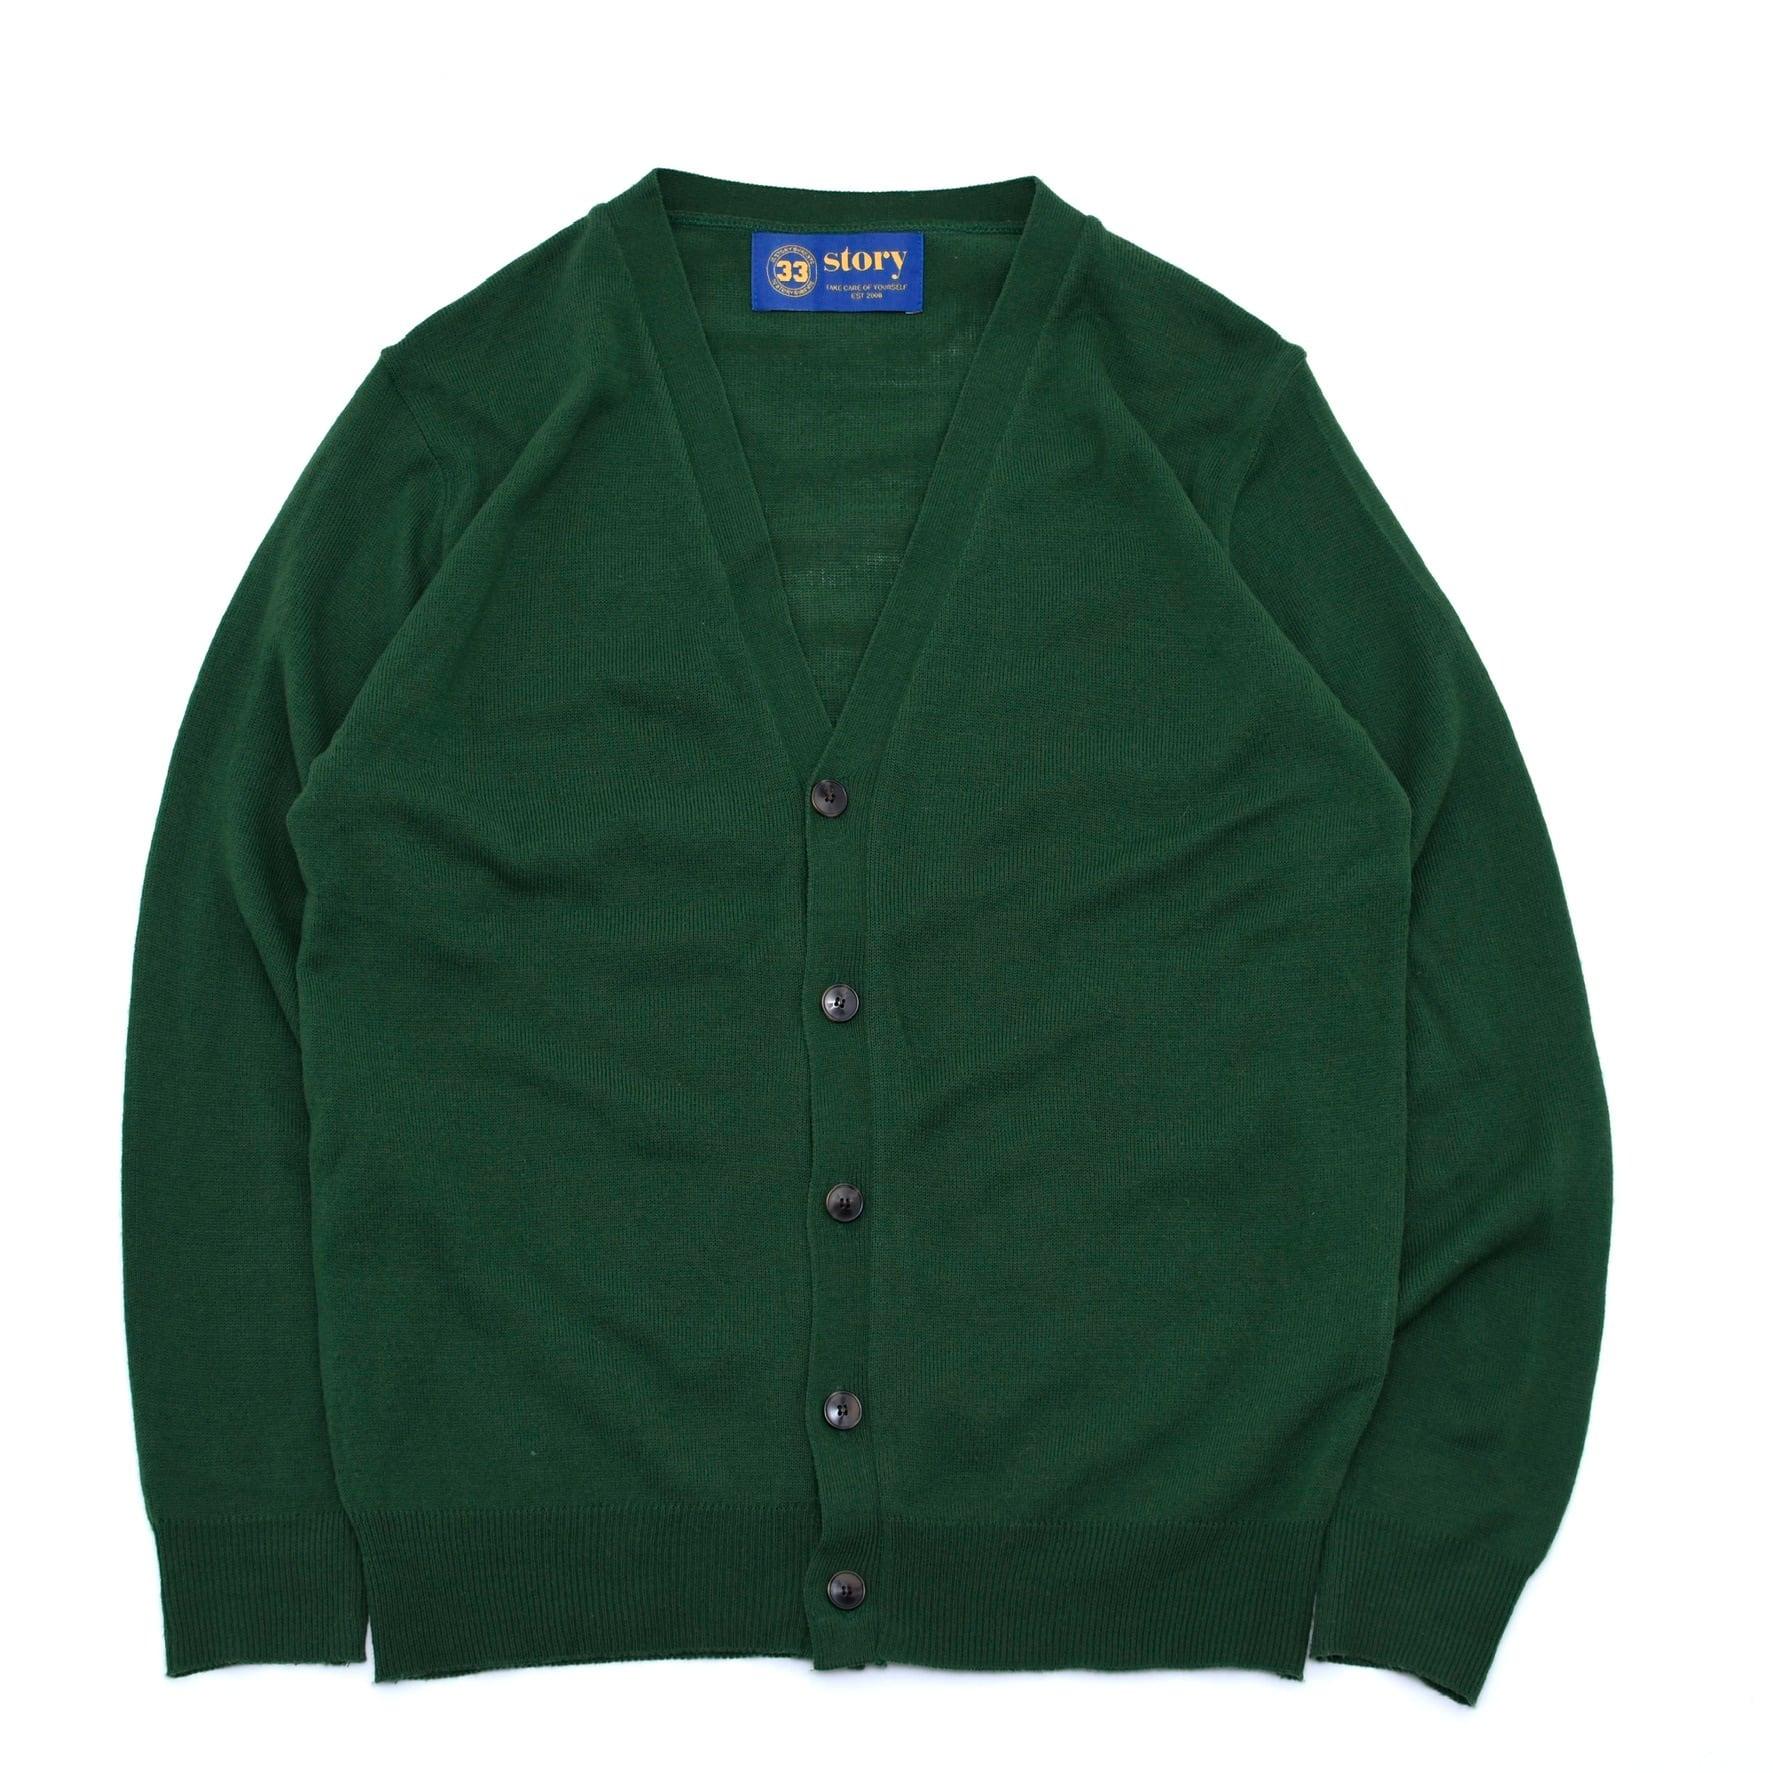 Olive green color knit cardigan